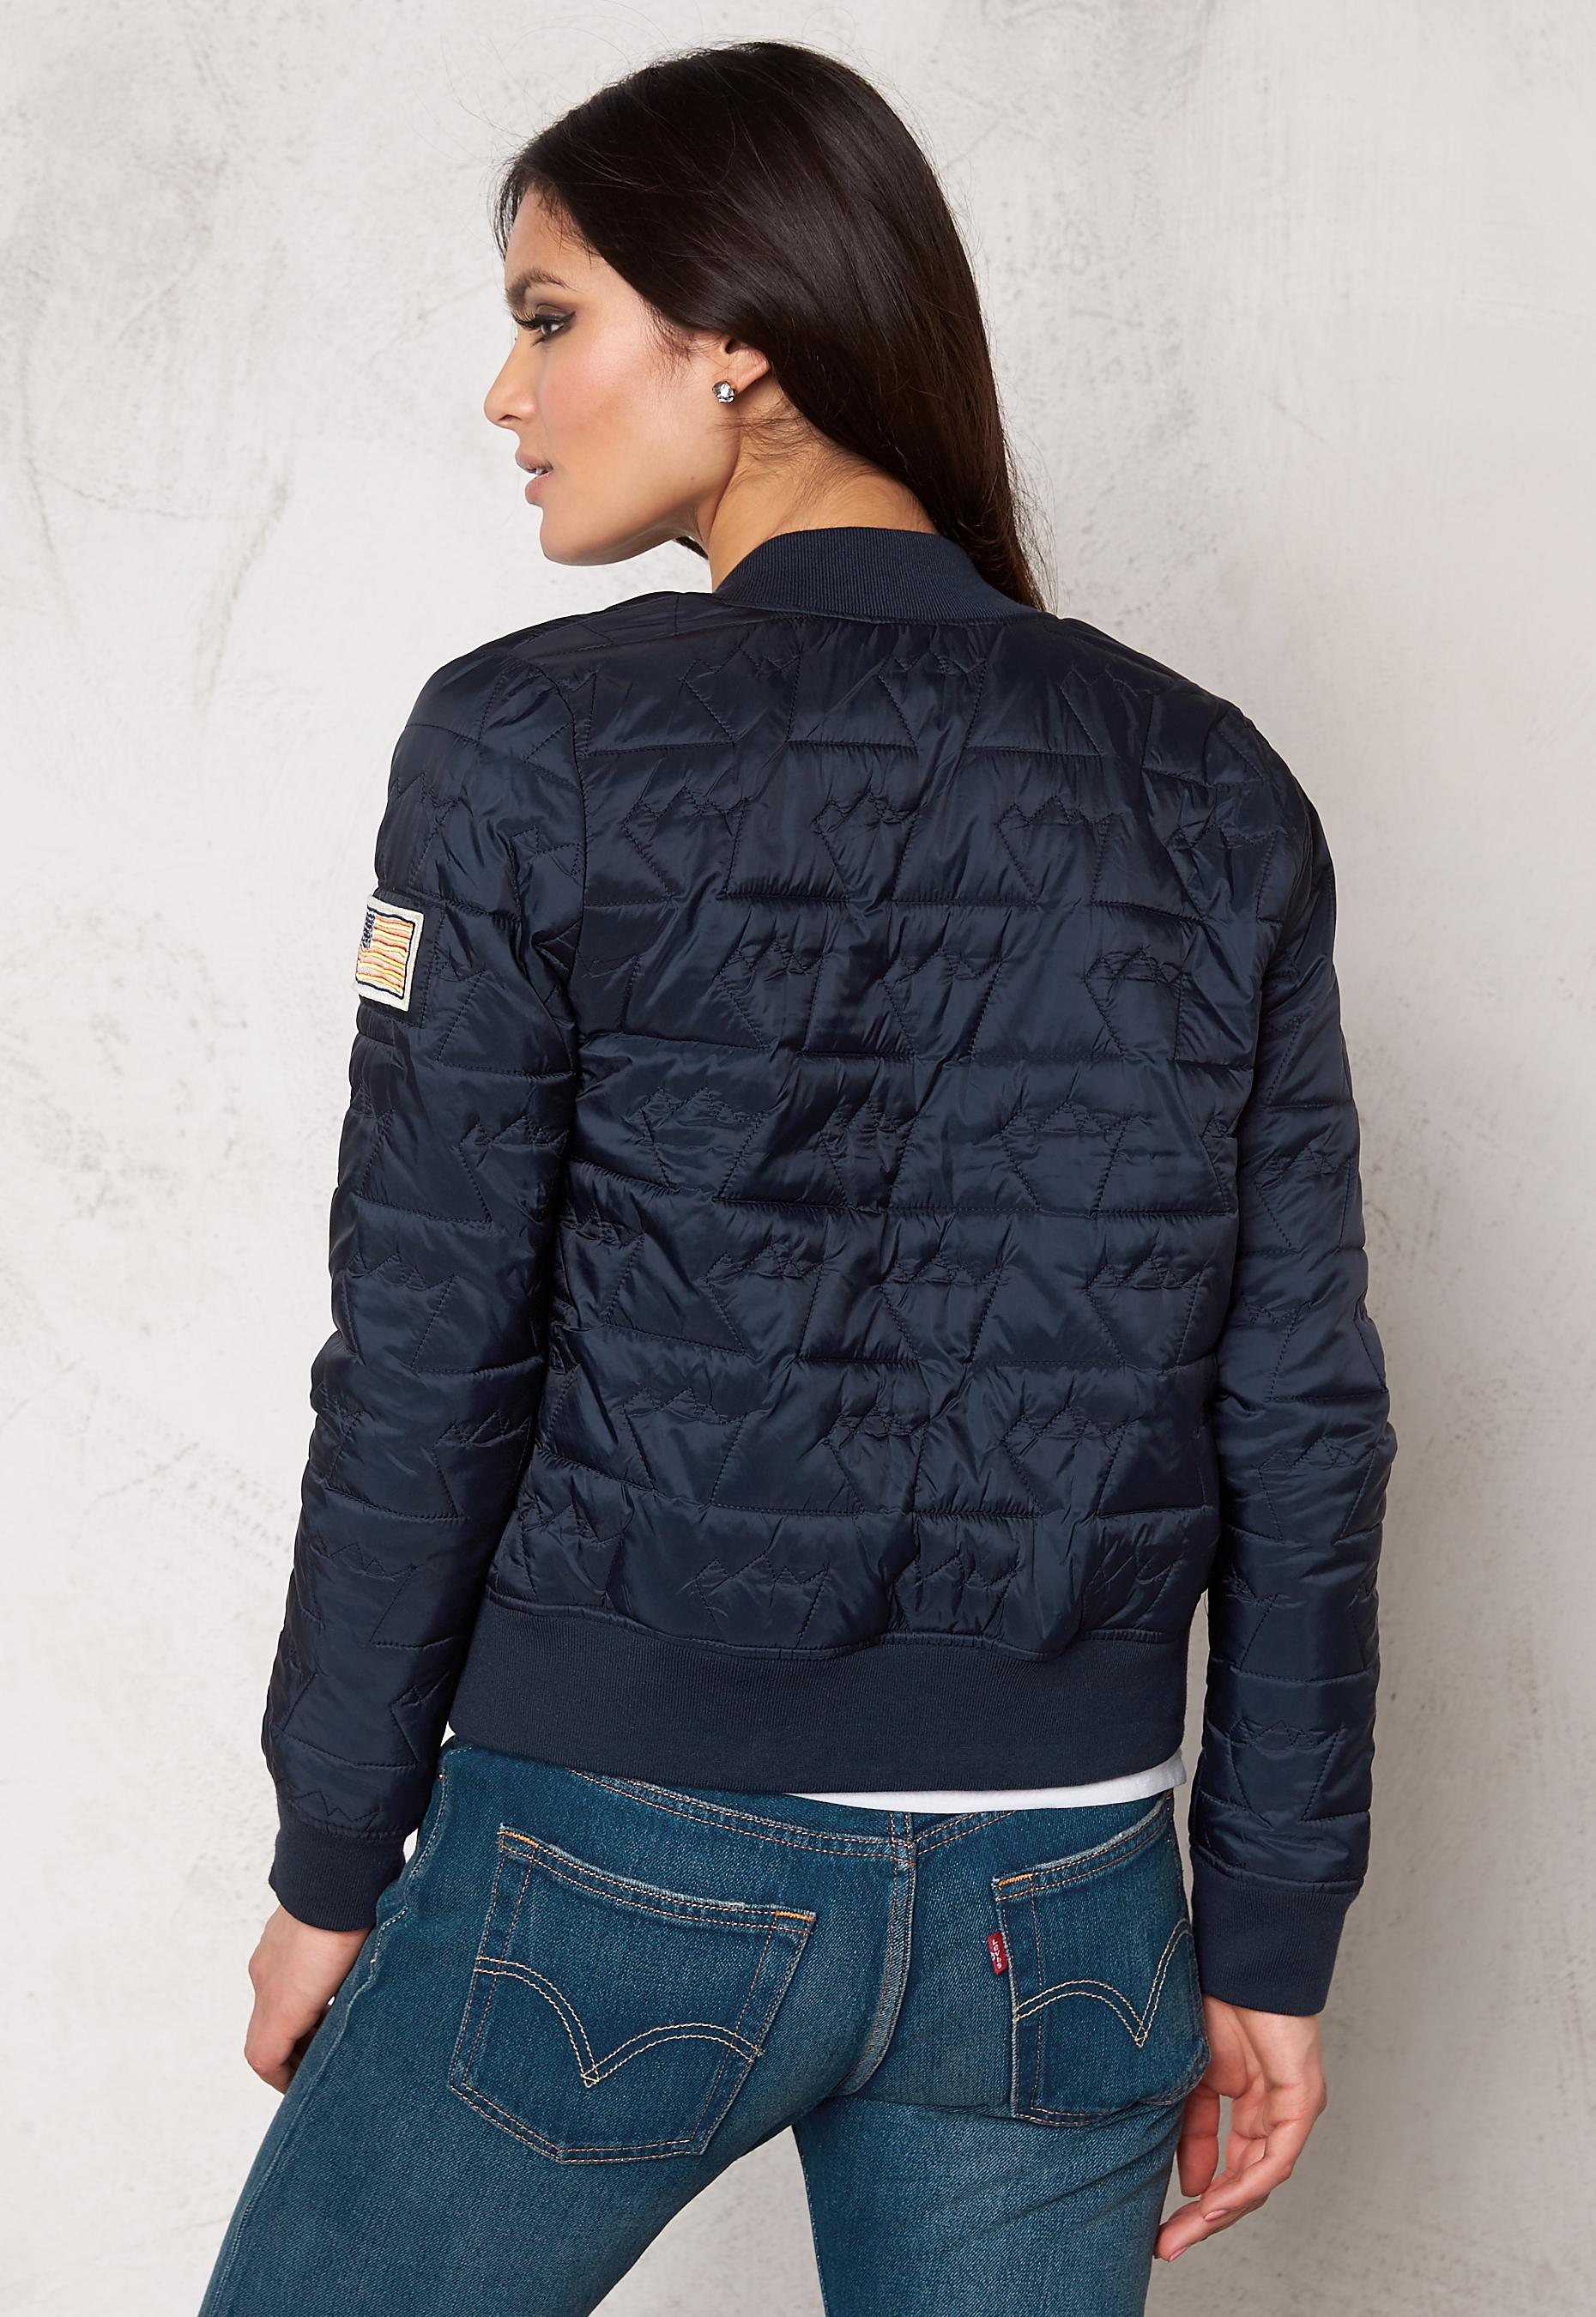 svea cara jacket